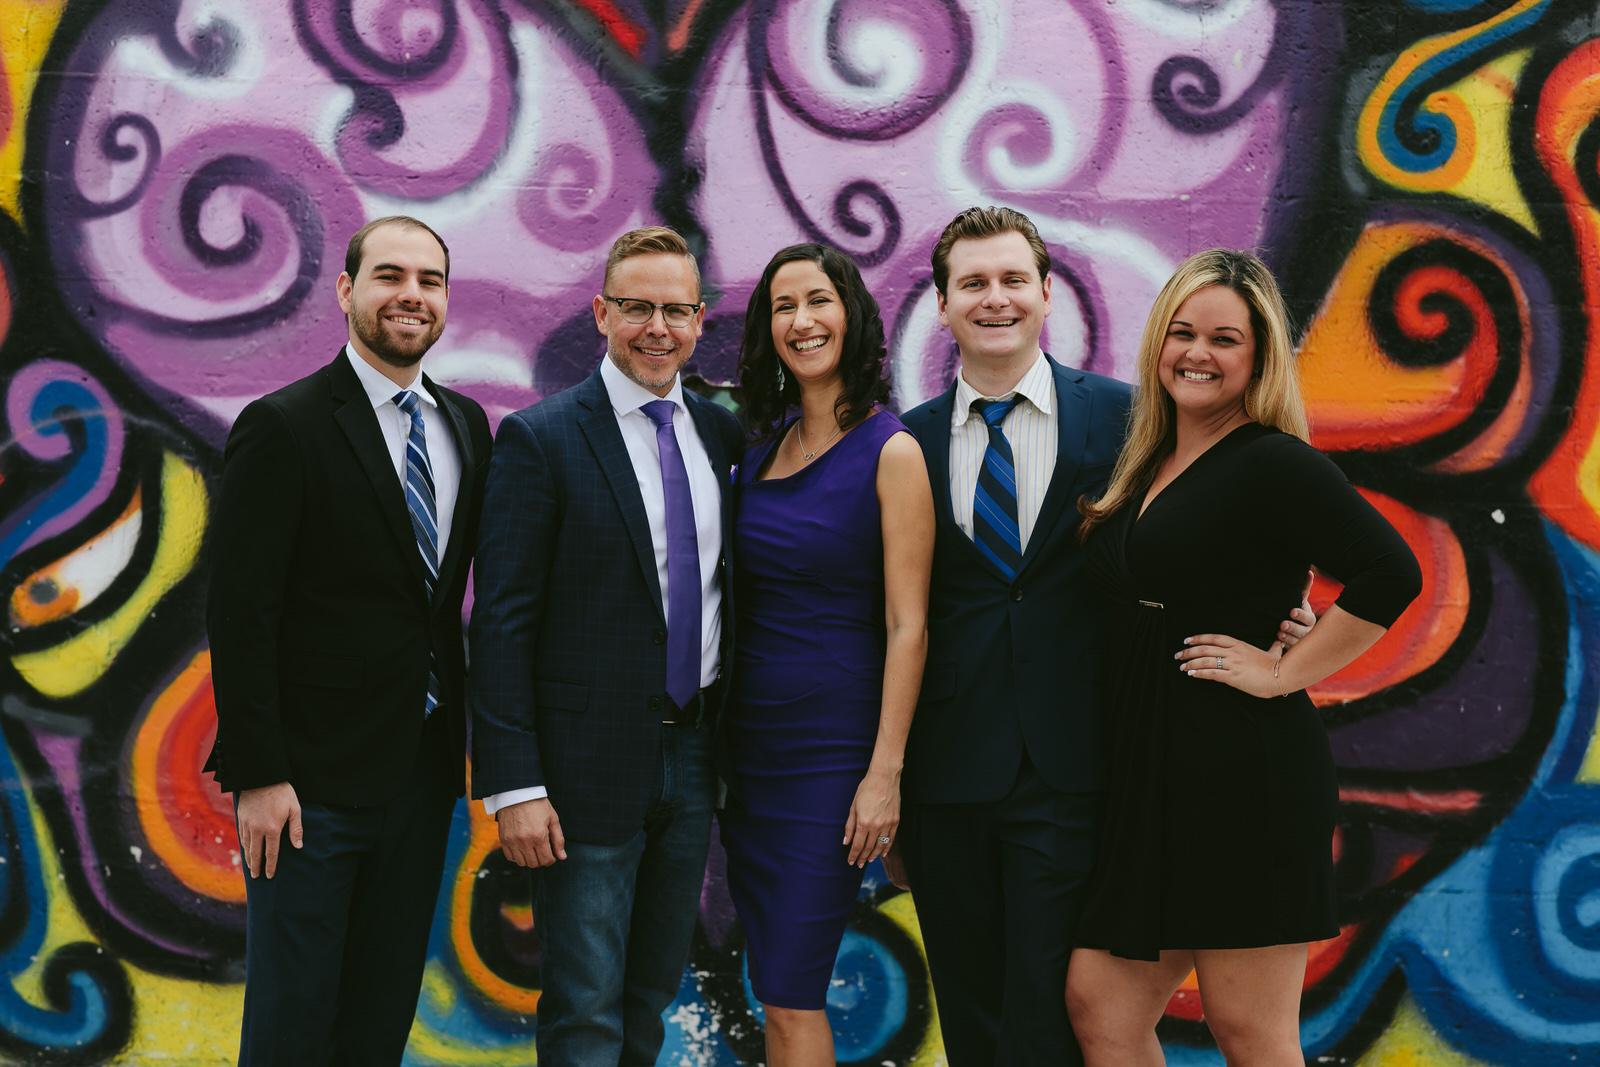 Purplewing_Branding_Portraits_Fort_Lauderdale_Tiny_House_Photo_Outdoor_Graffiti_Headshots-57.jpg